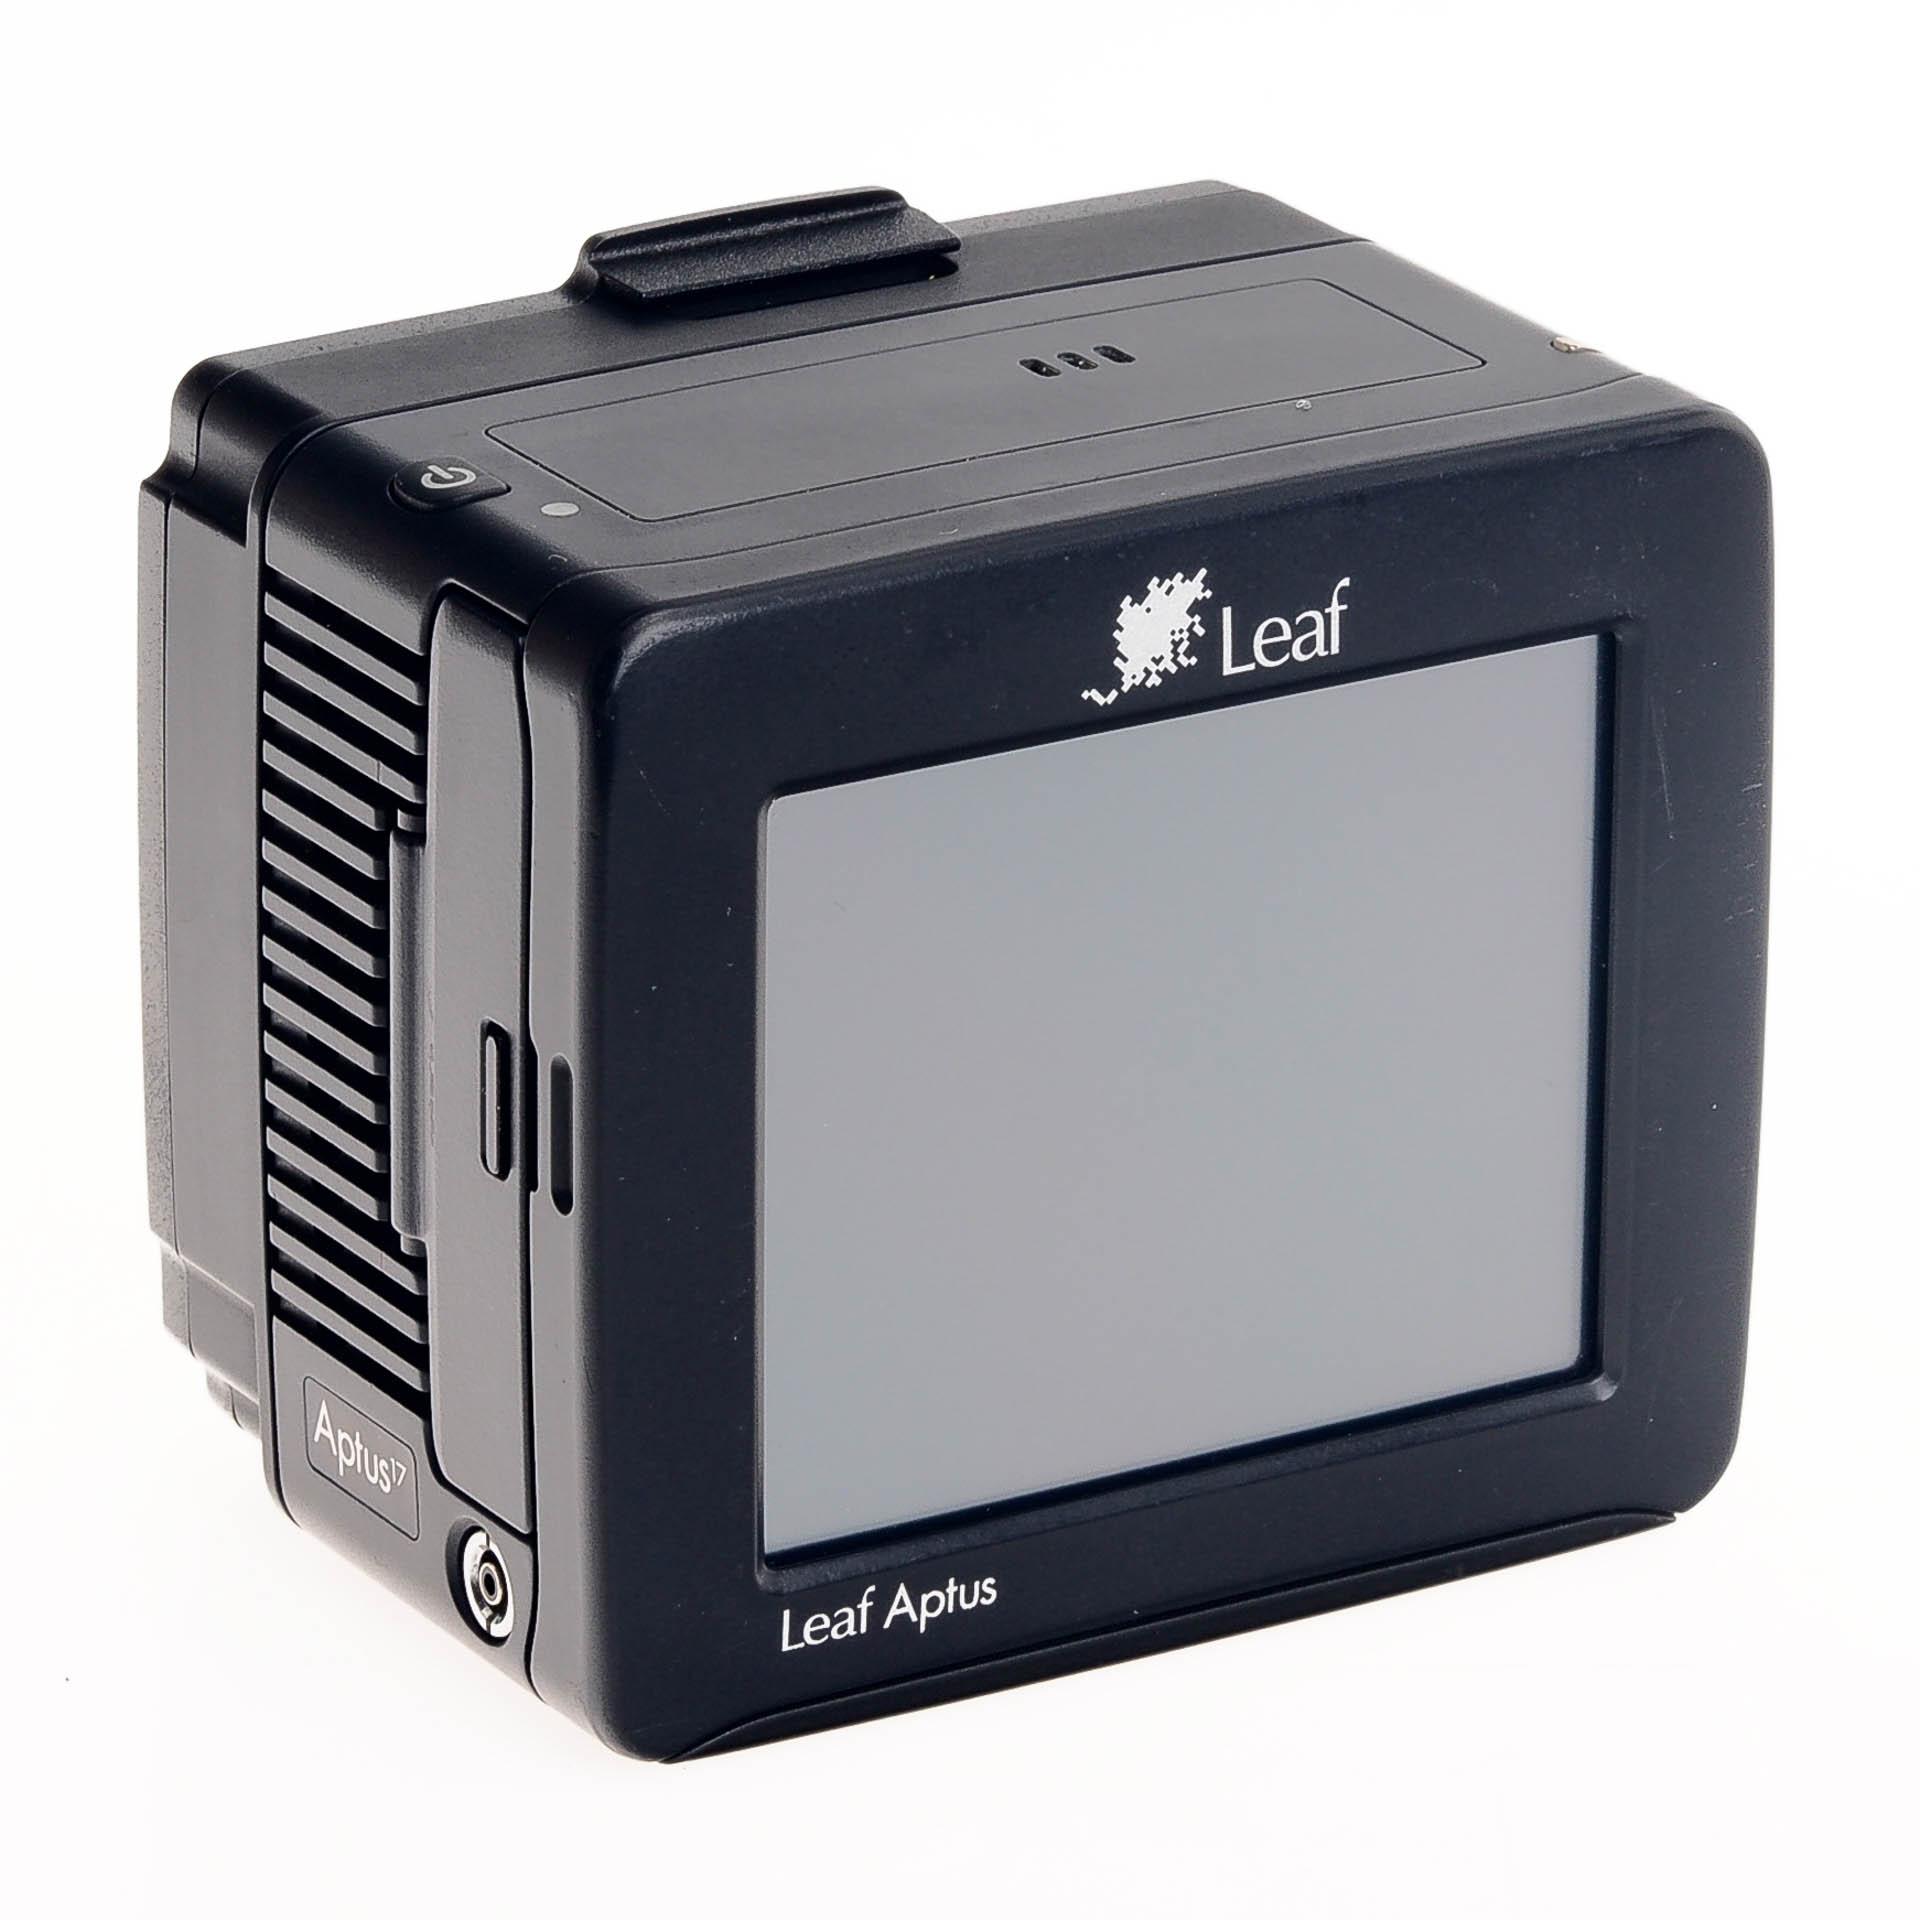 Used Film Cameras Medium & Large Format - National Camera